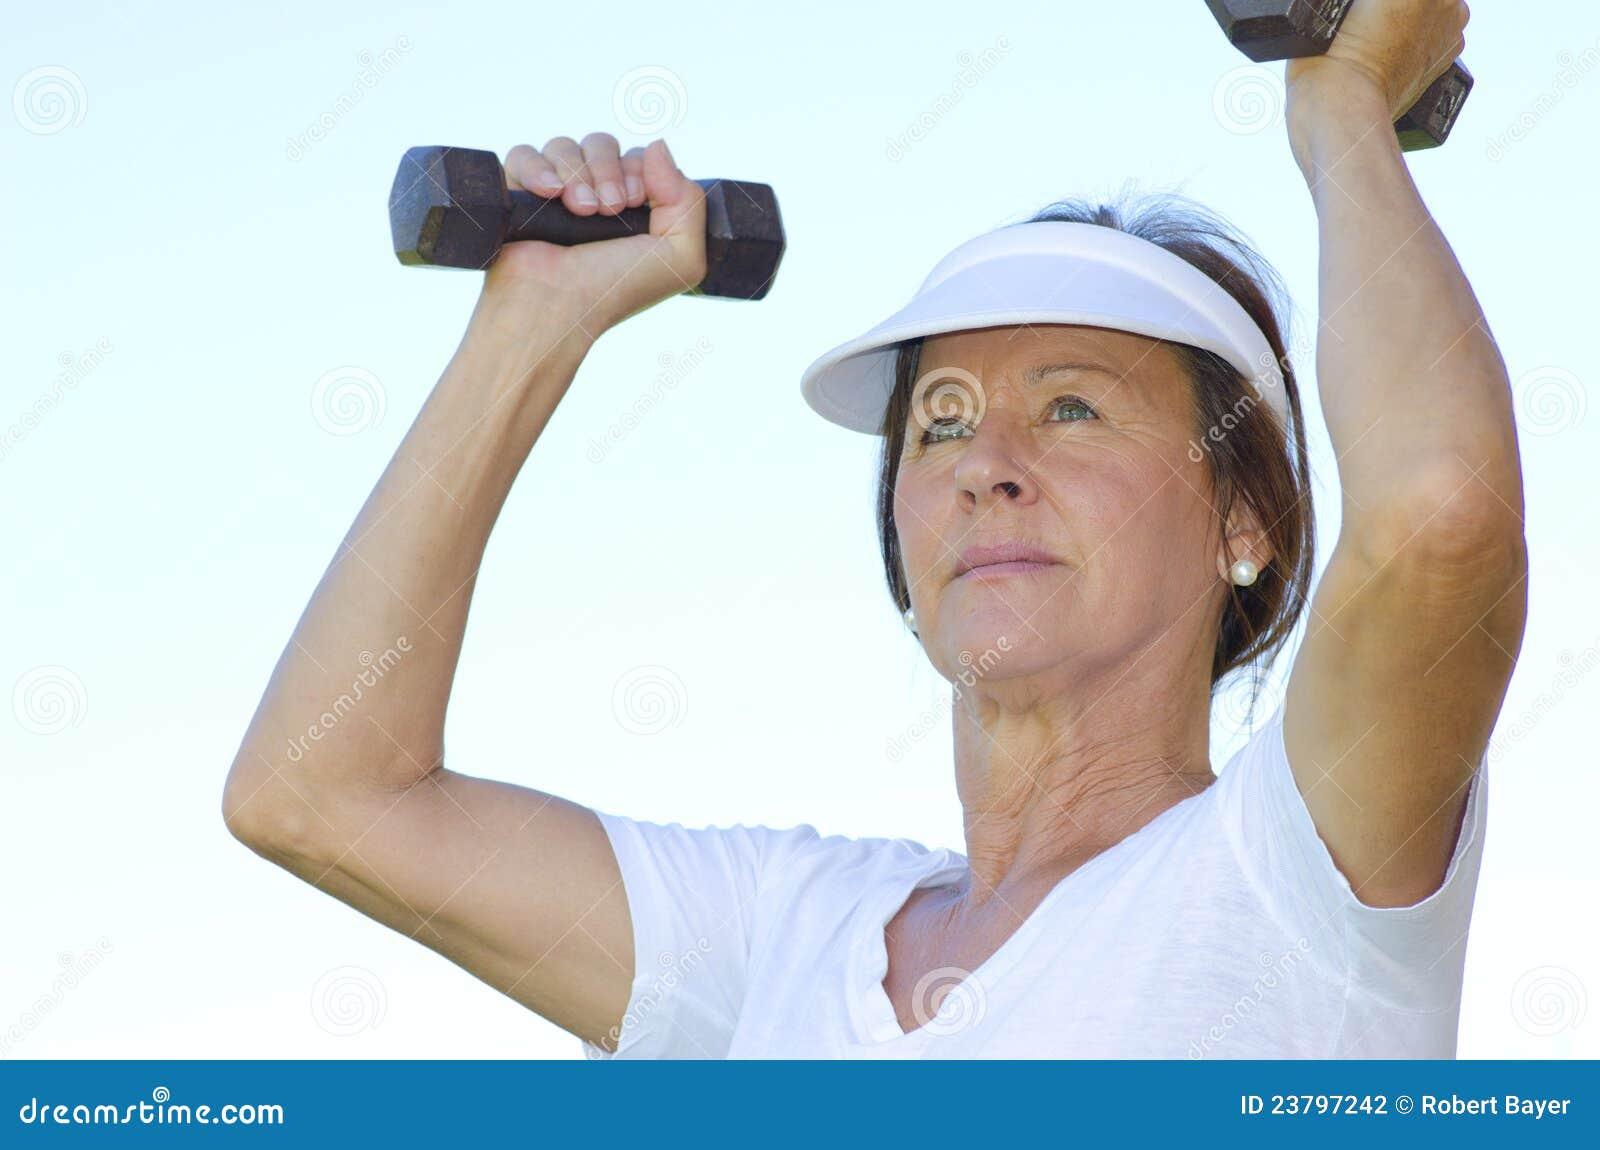 Mature woman lifting weights II